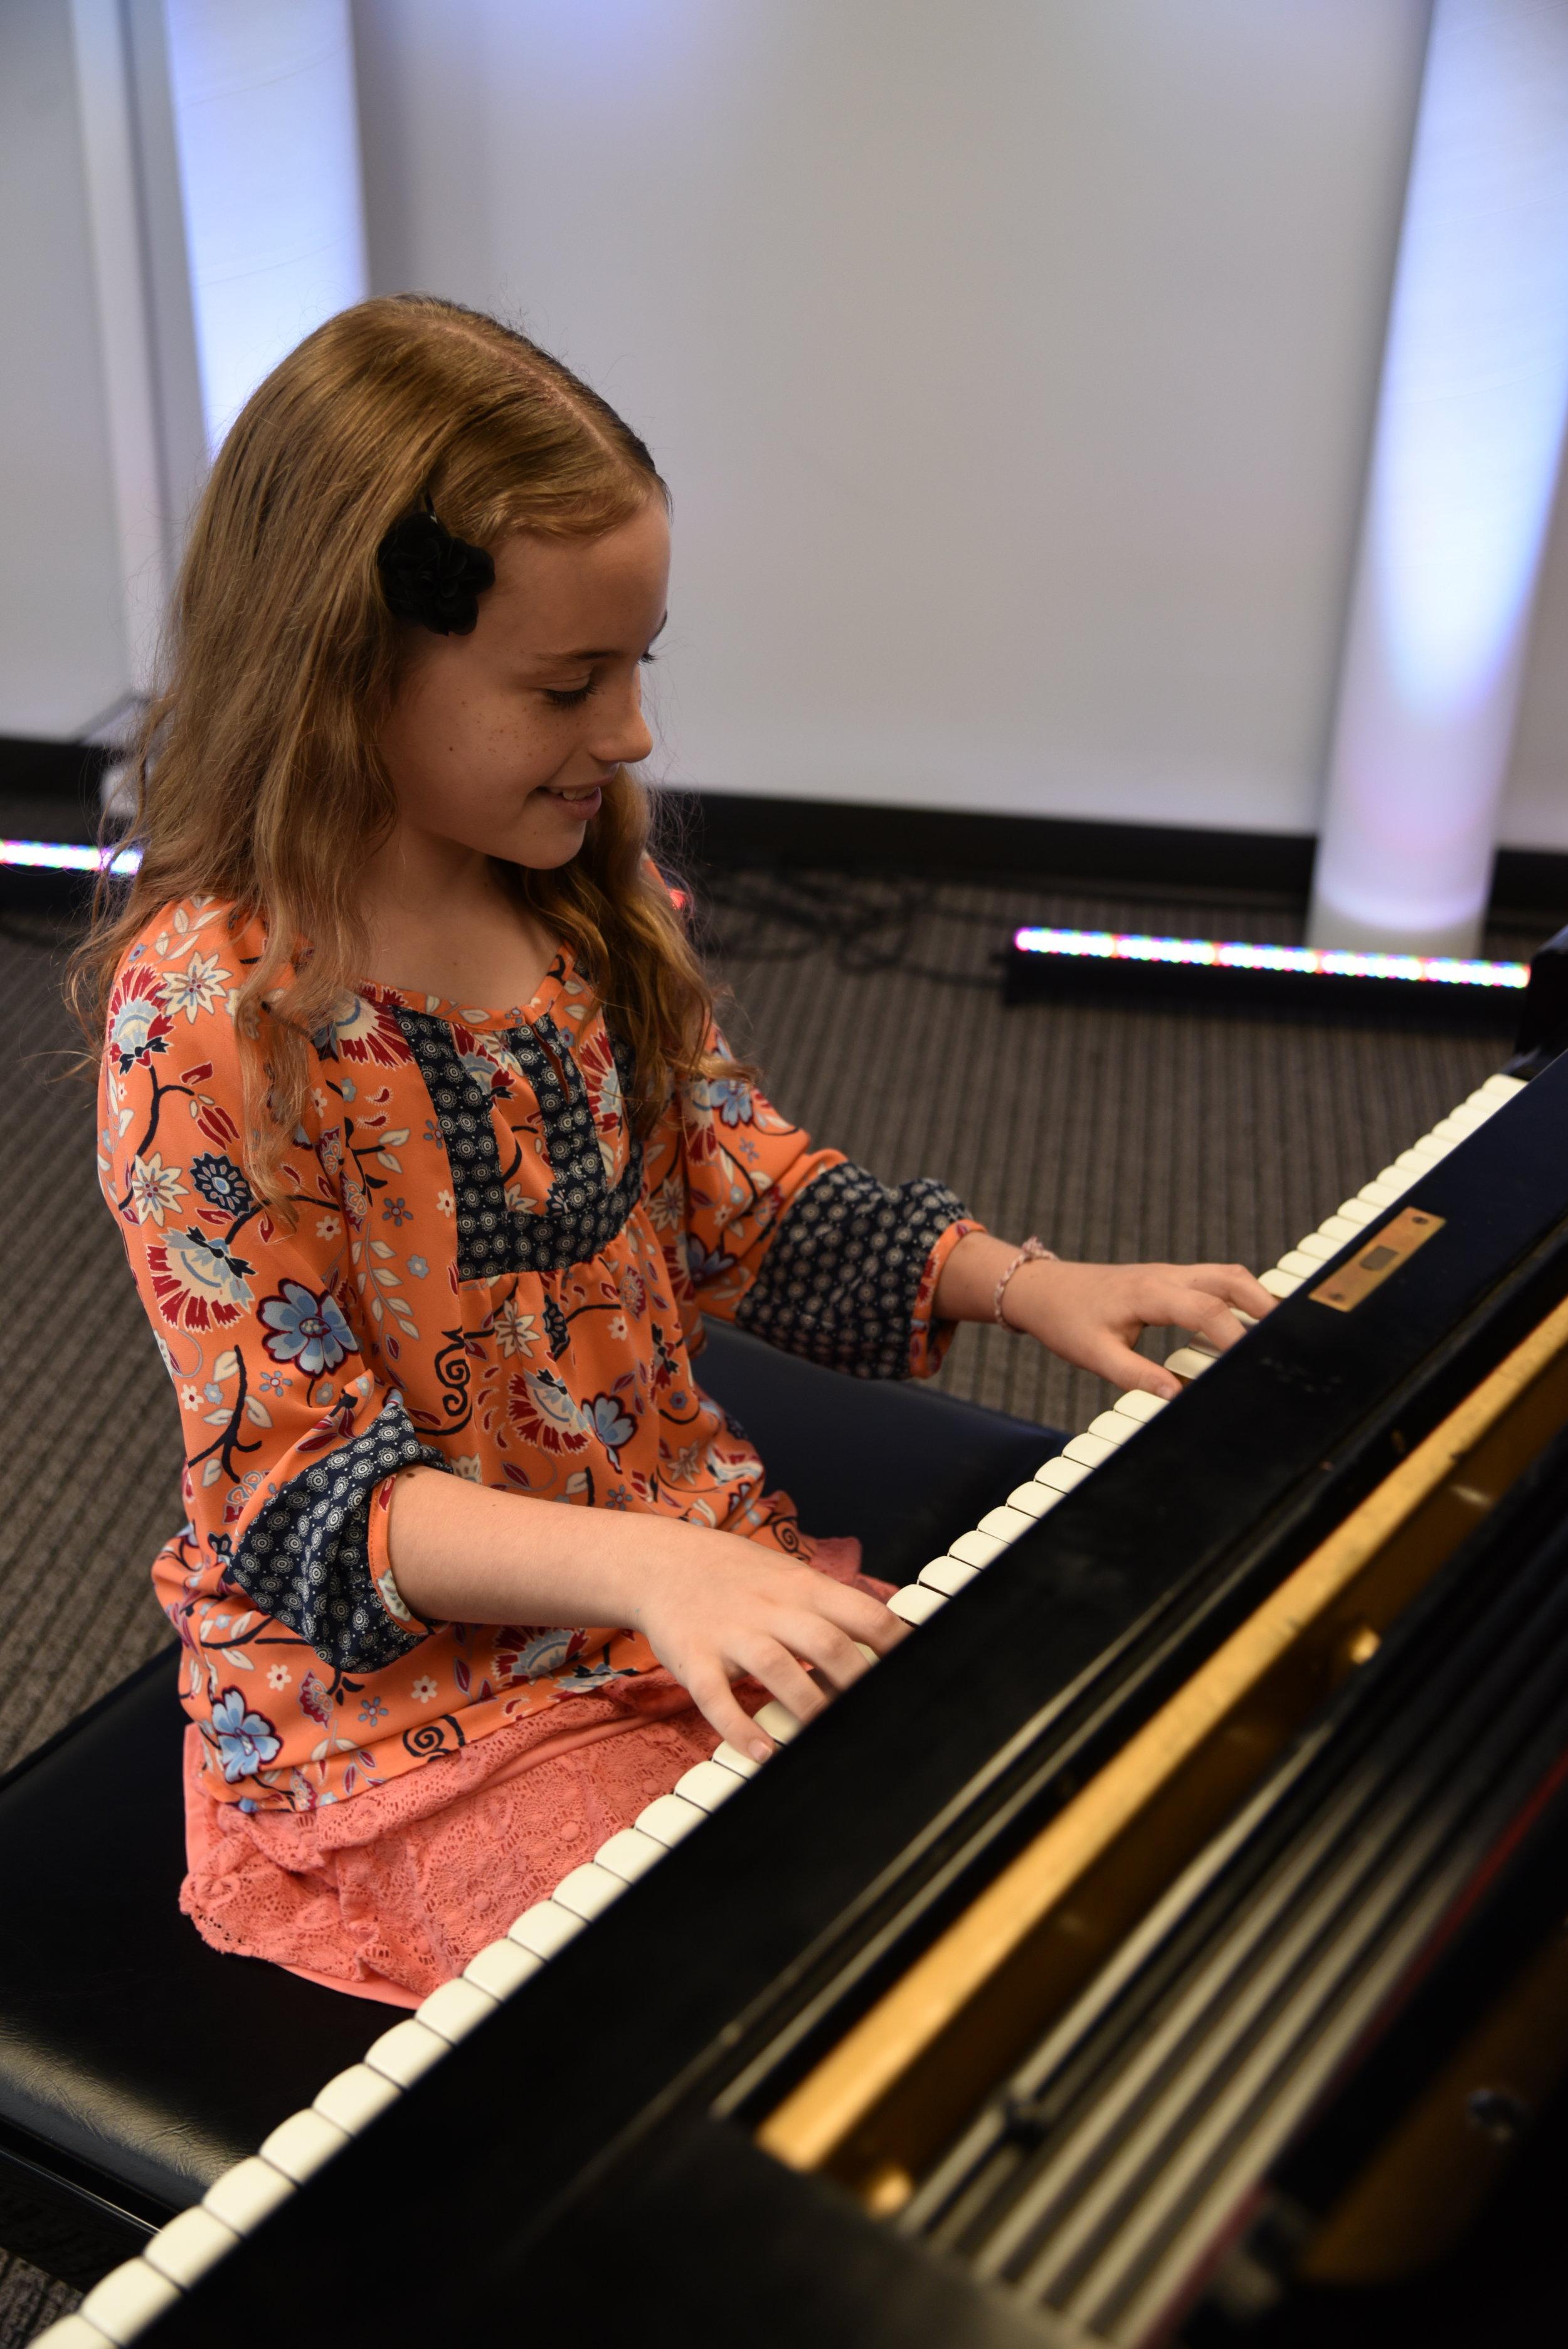 girl piano 9.JPG